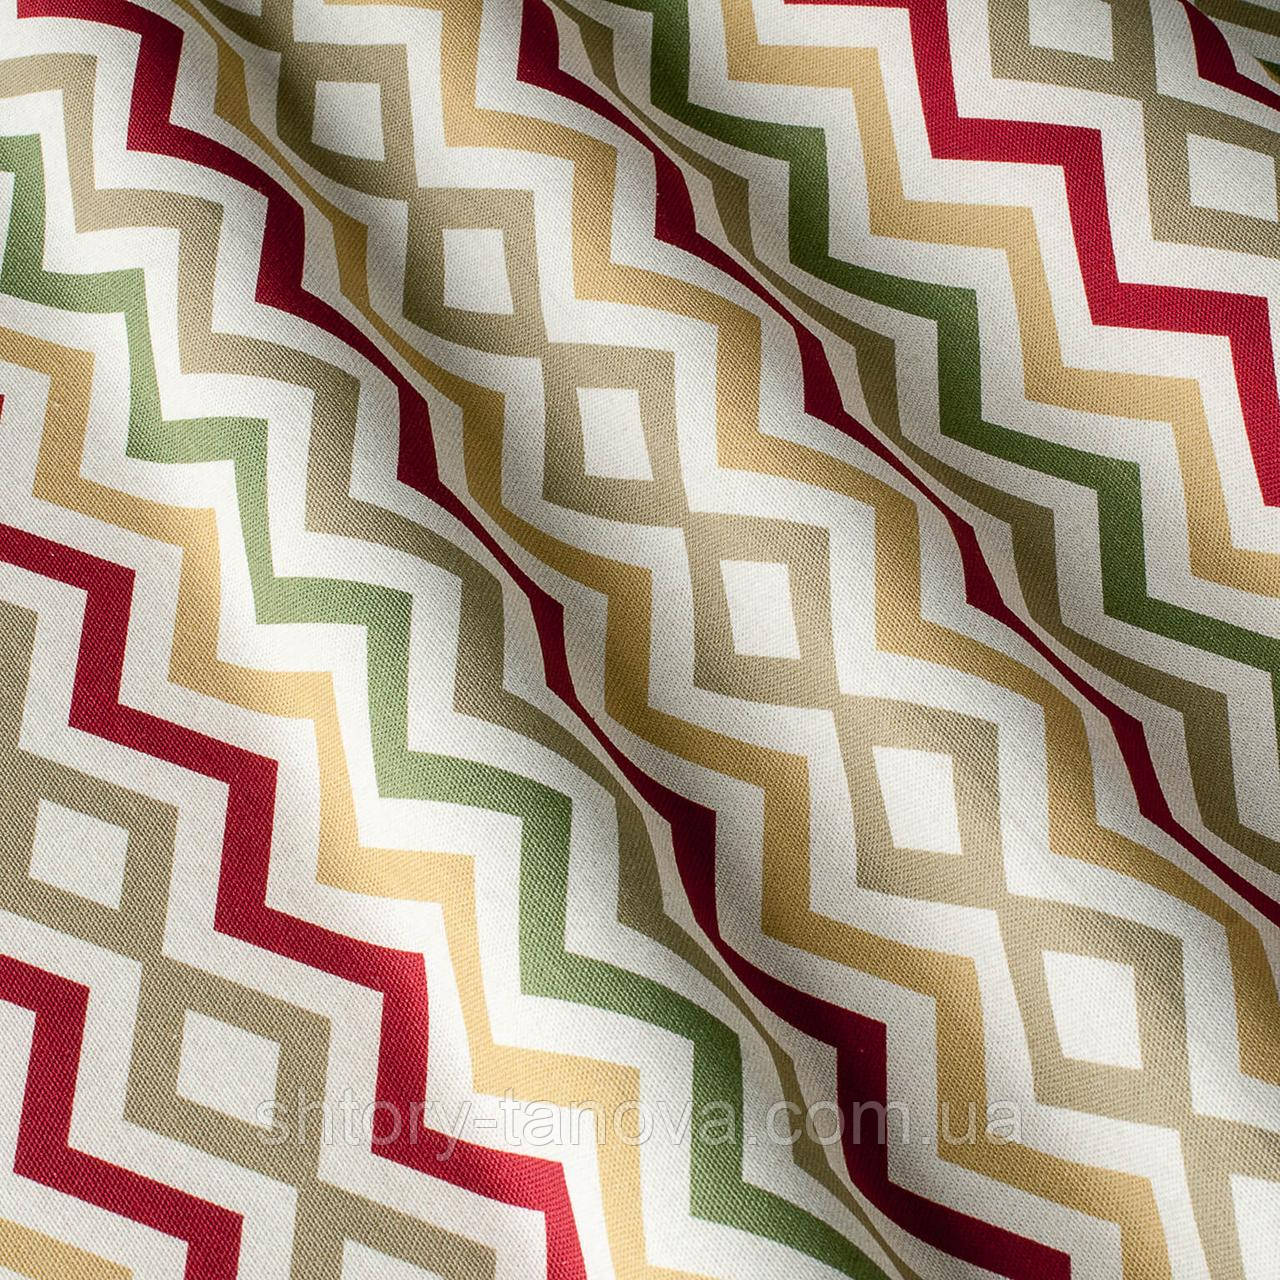 Декоративная ткань принт узор